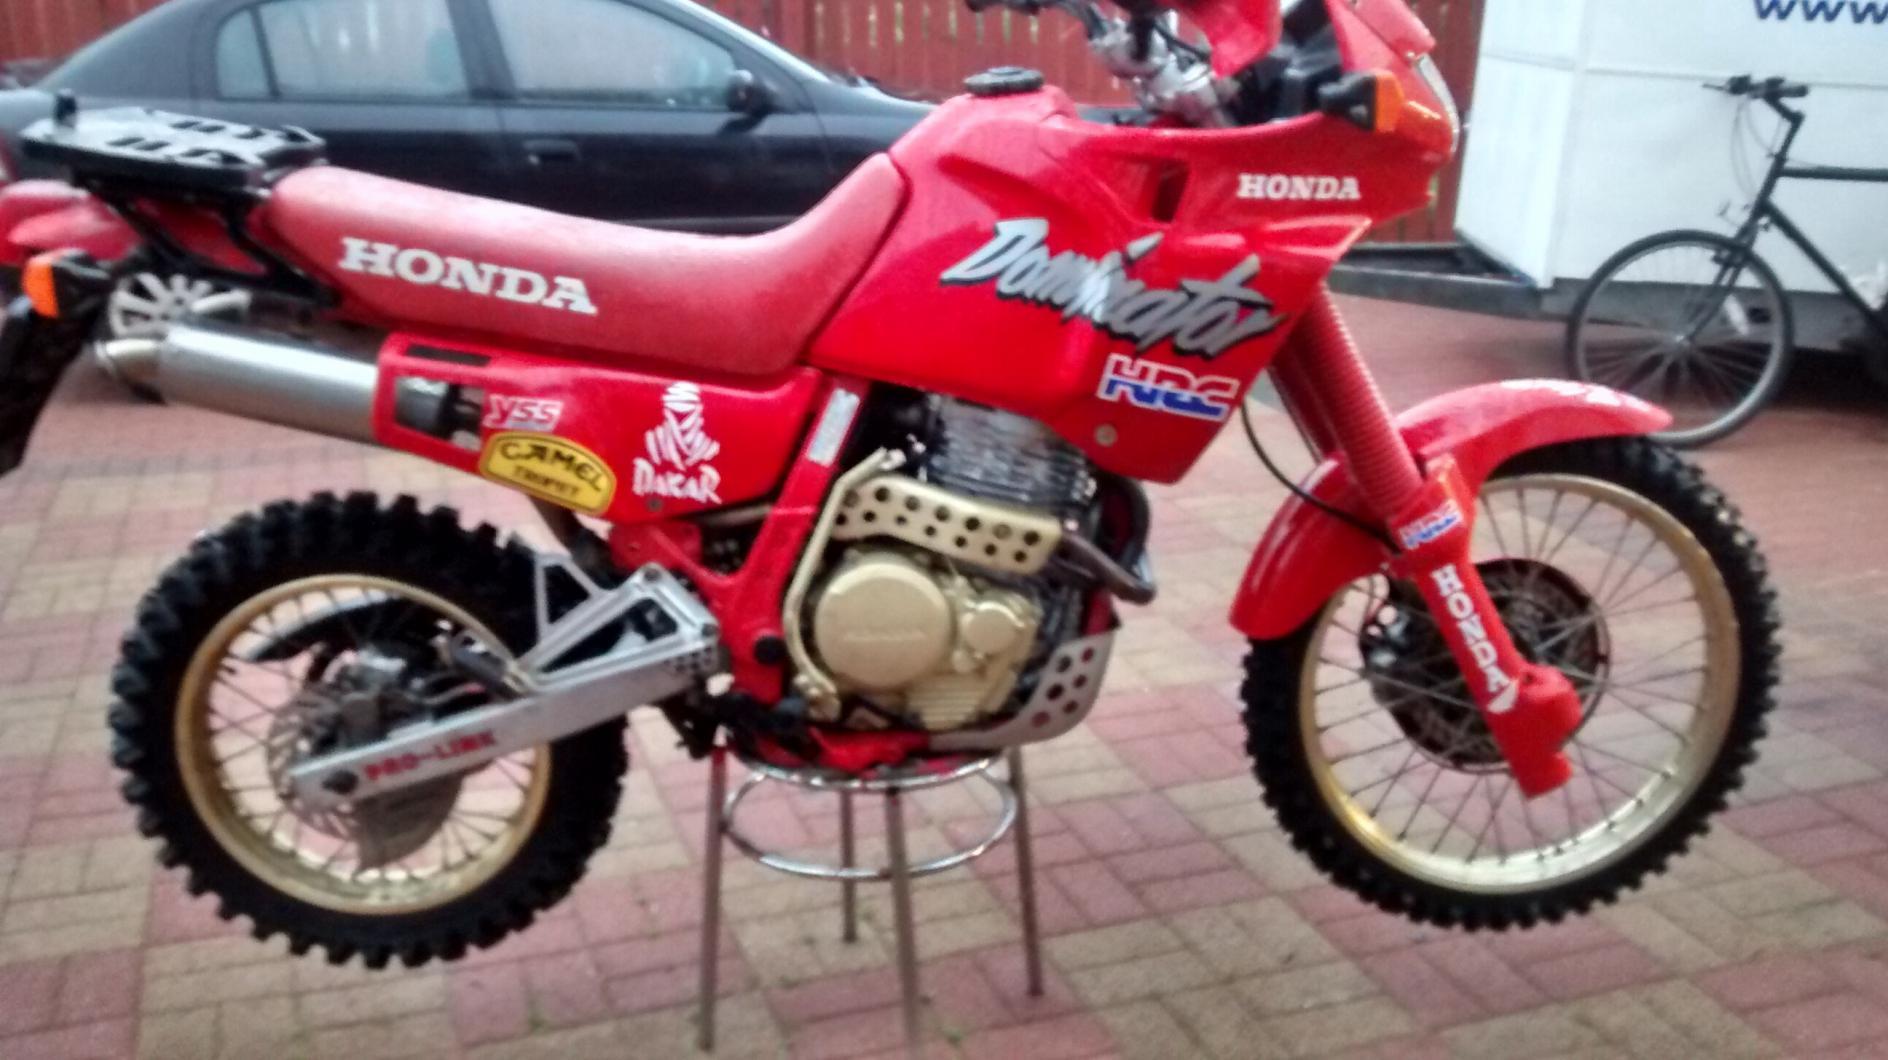 HONDA honda-650-nx-dominator-rd02-1990-permis-a2 occasion